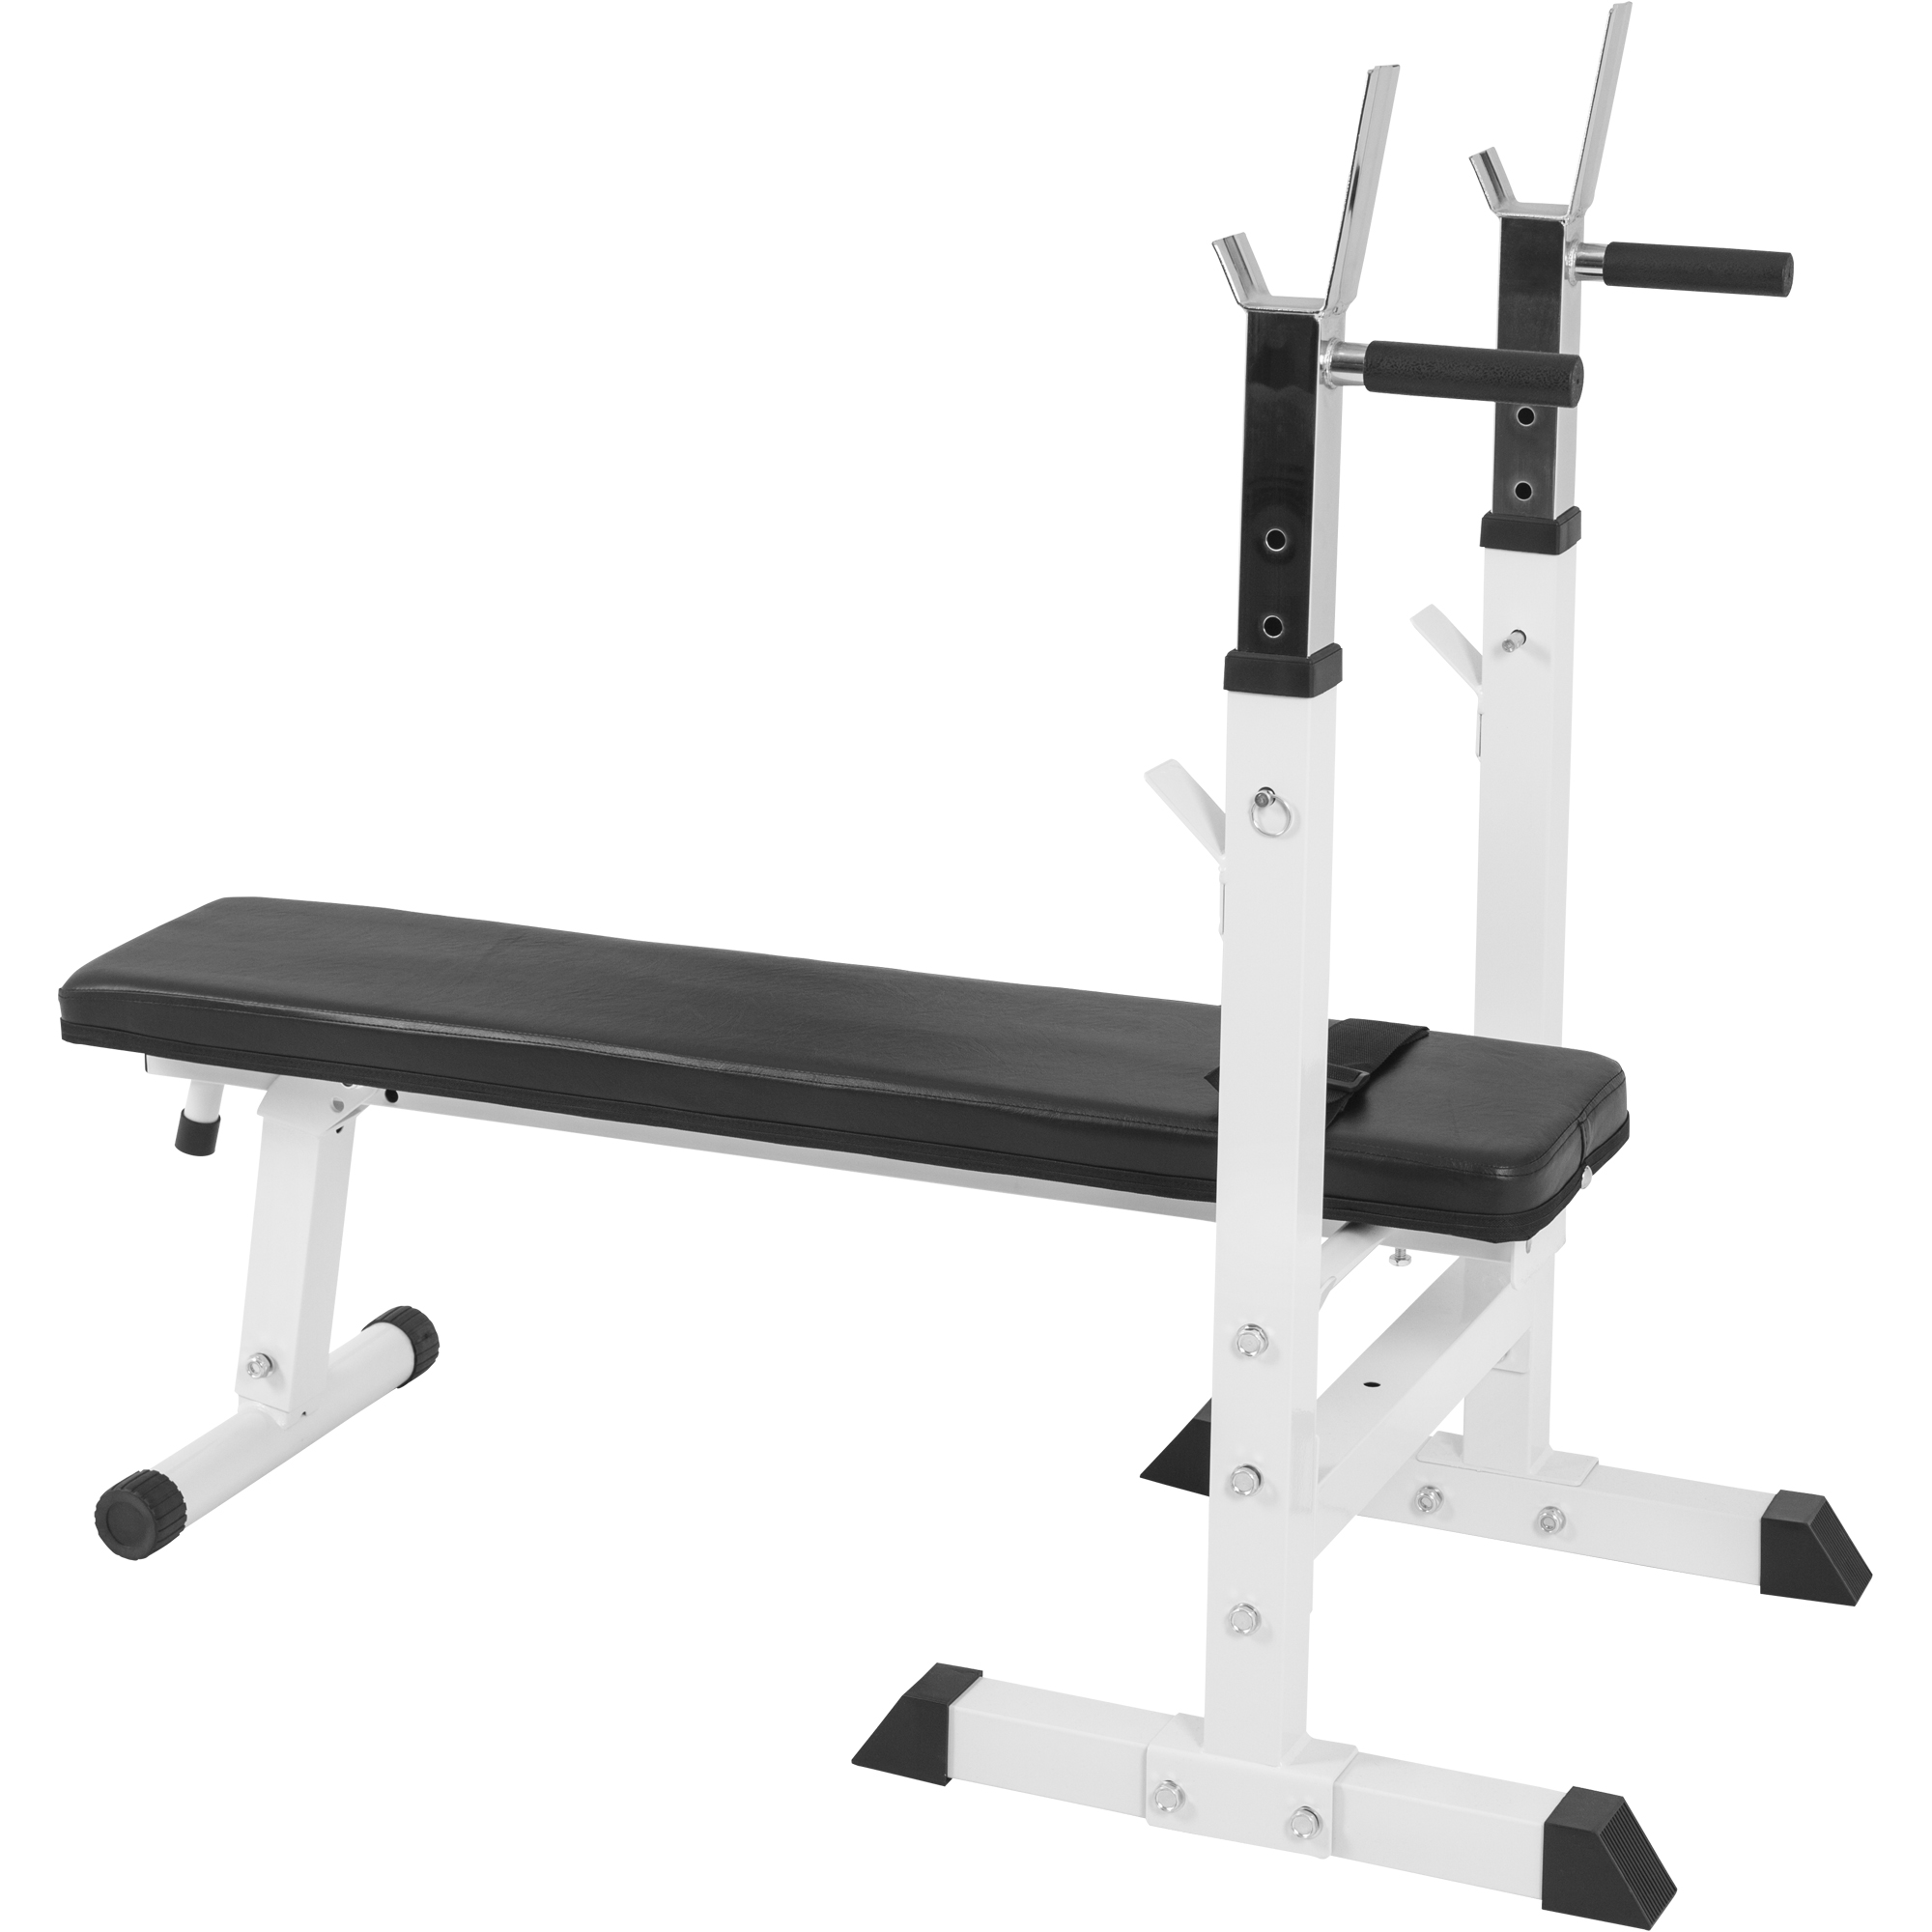 banc de musculation avec support de barres 10000118 blanc 10000118white. Black Bedroom Furniture Sets. Home Design Ideas